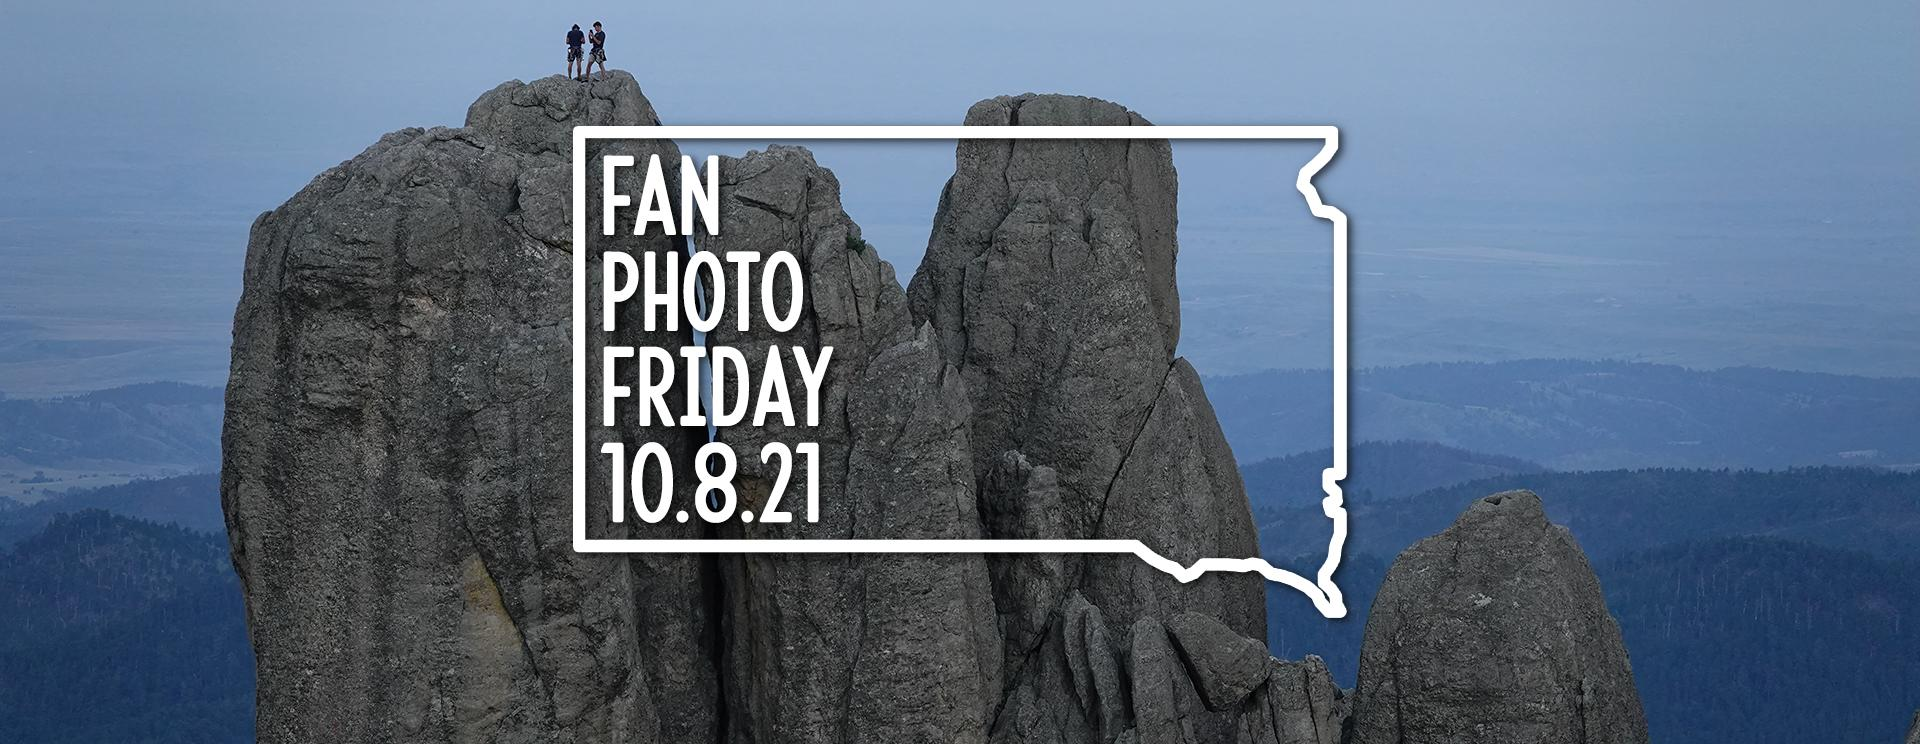 Fan Photo Friday   Oct. 8, 2021